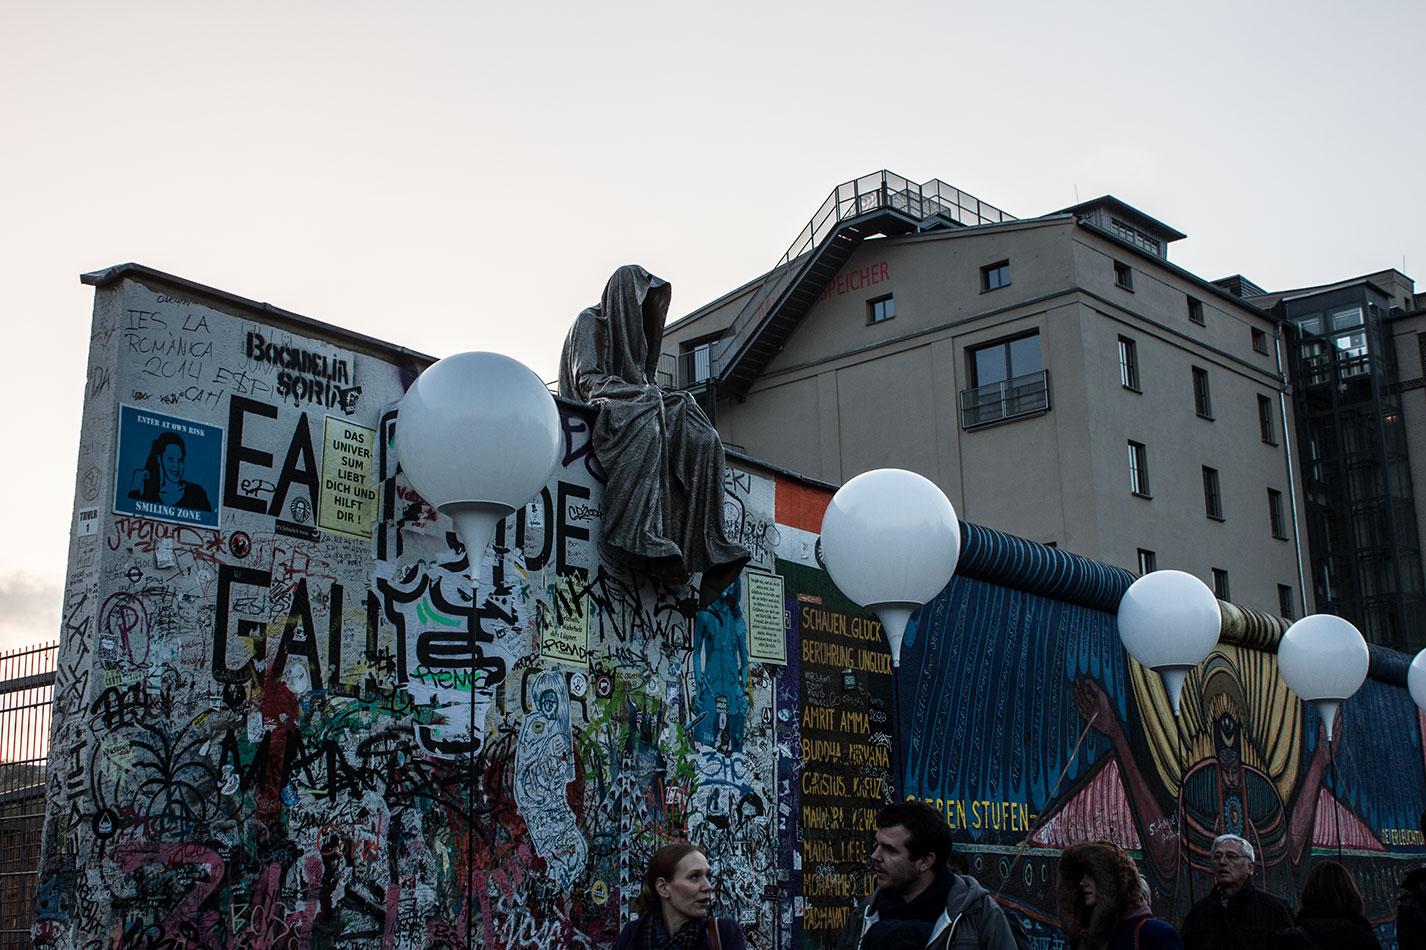 25-jears-wallfall-berlin-germany-contemporary-fine-art-show-arts-design-guardians-of-time-manfred-kili-kielnhofer-4256